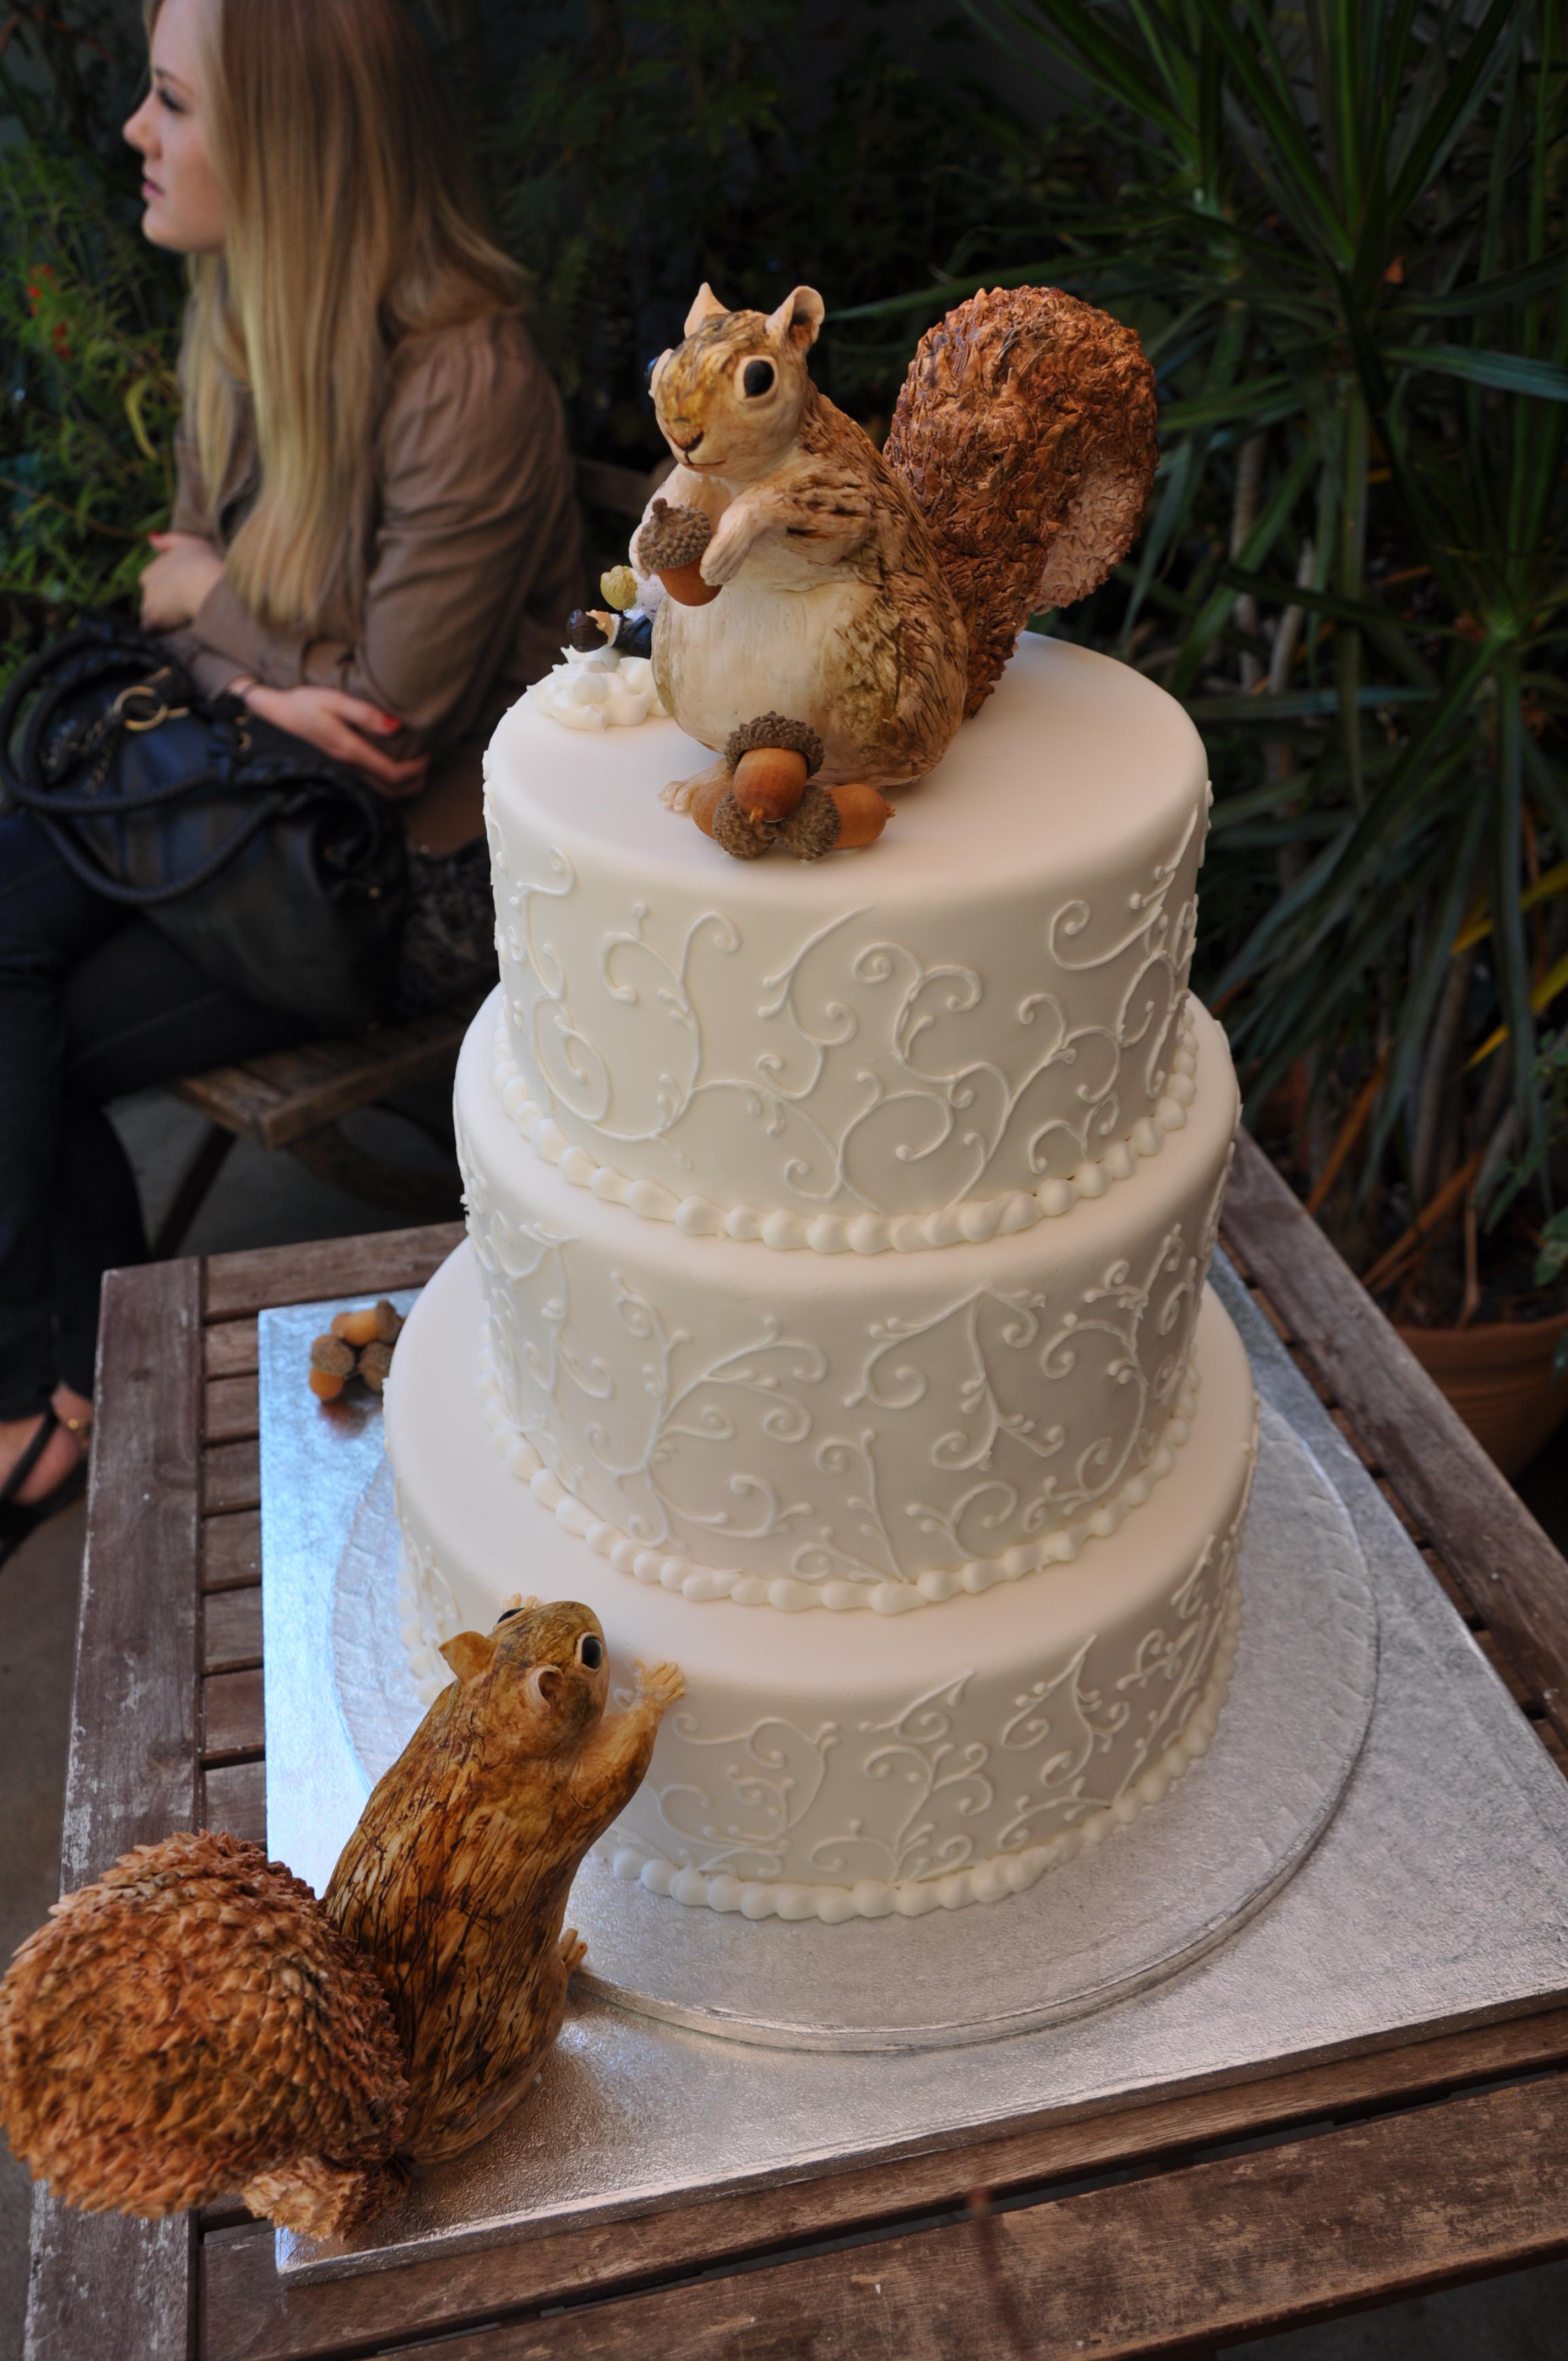 Squirrels Attack Wedding Cake